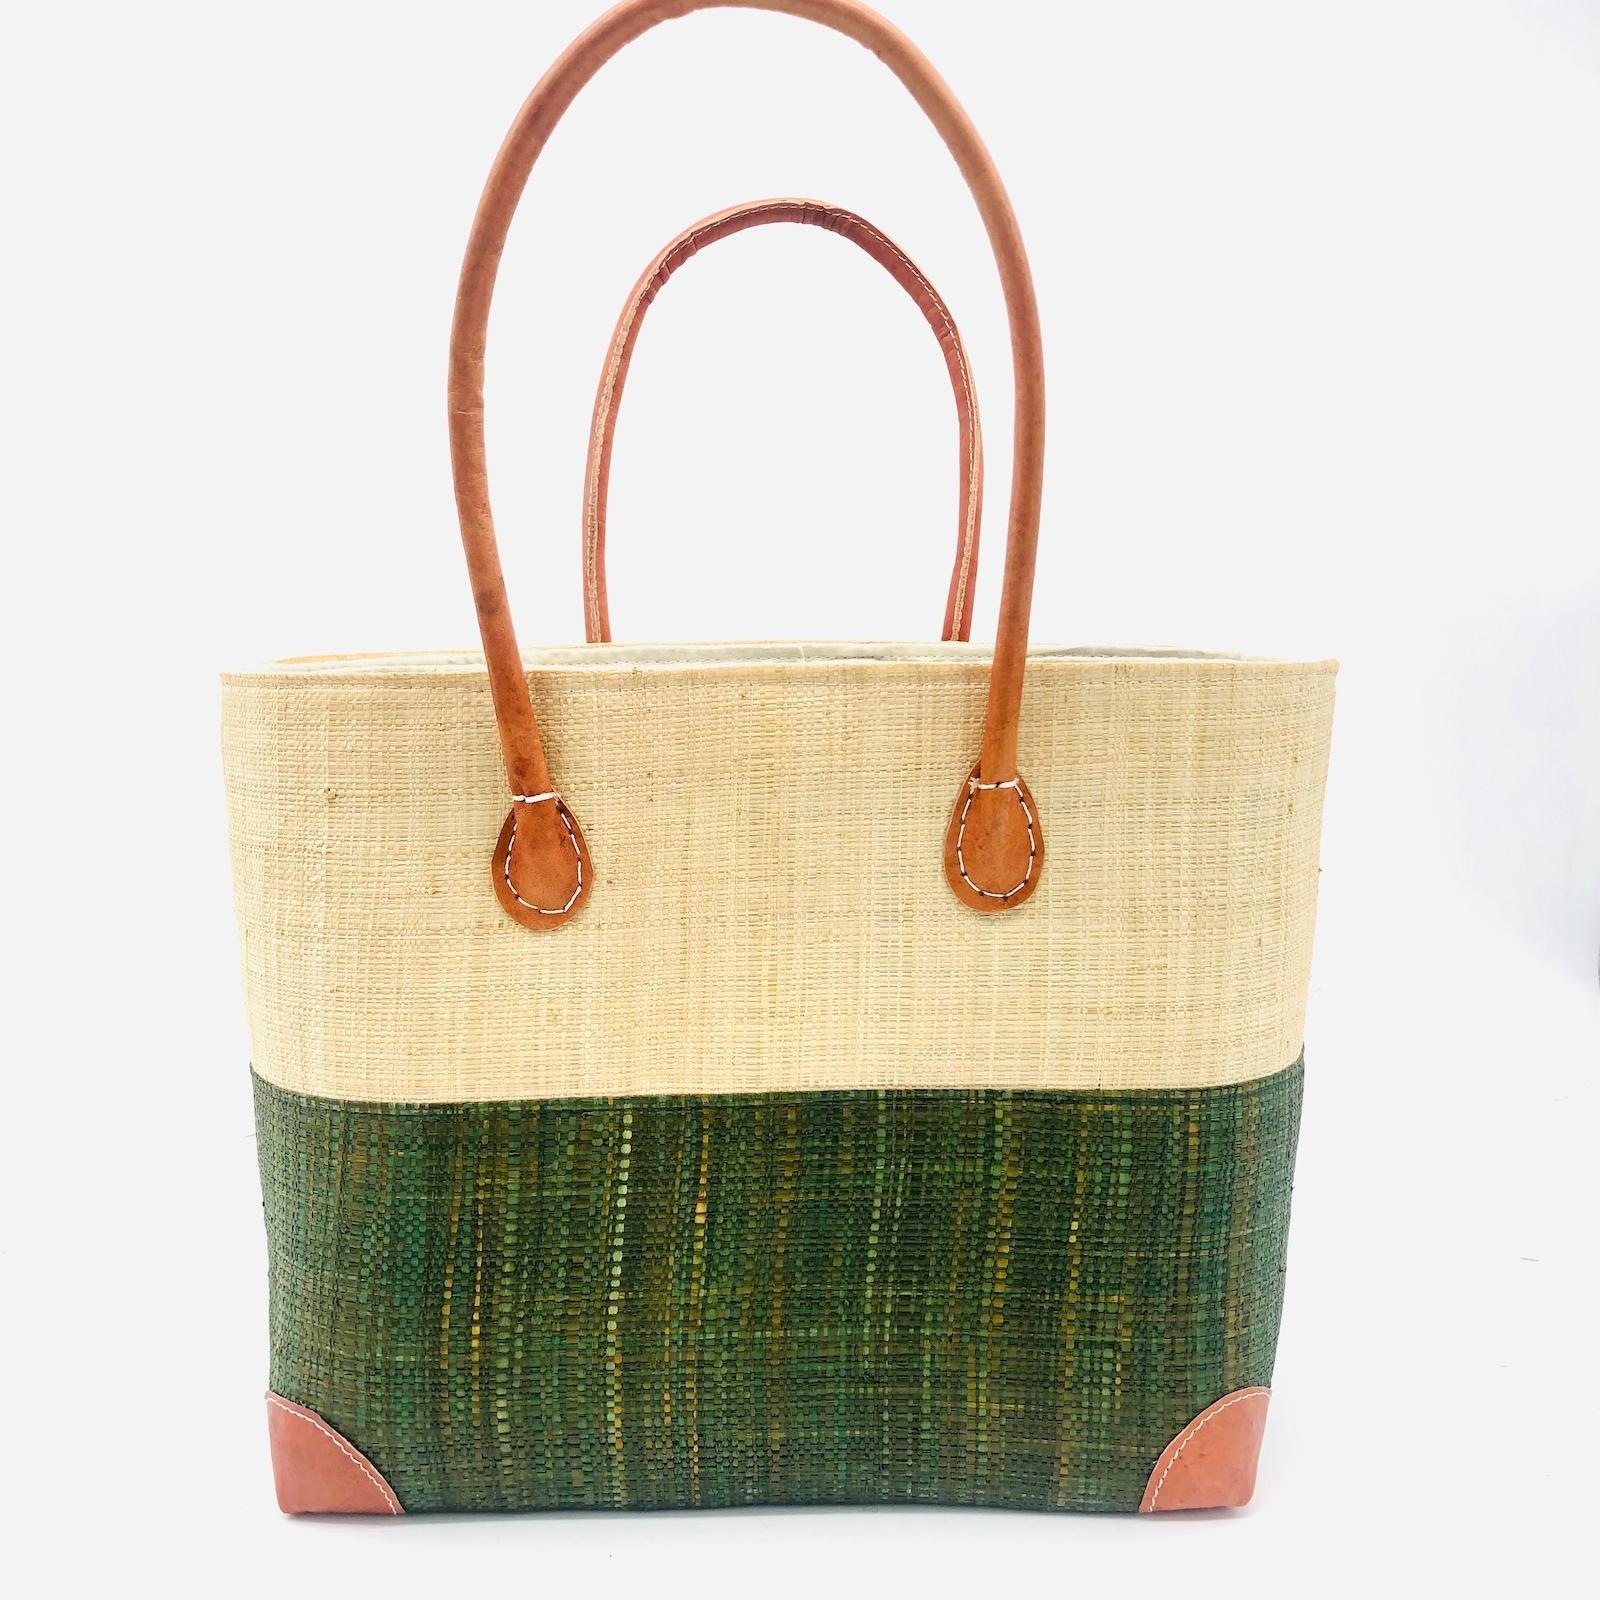 Trinidad Two Tone Straw Basket - Olive | Trada Marketplace